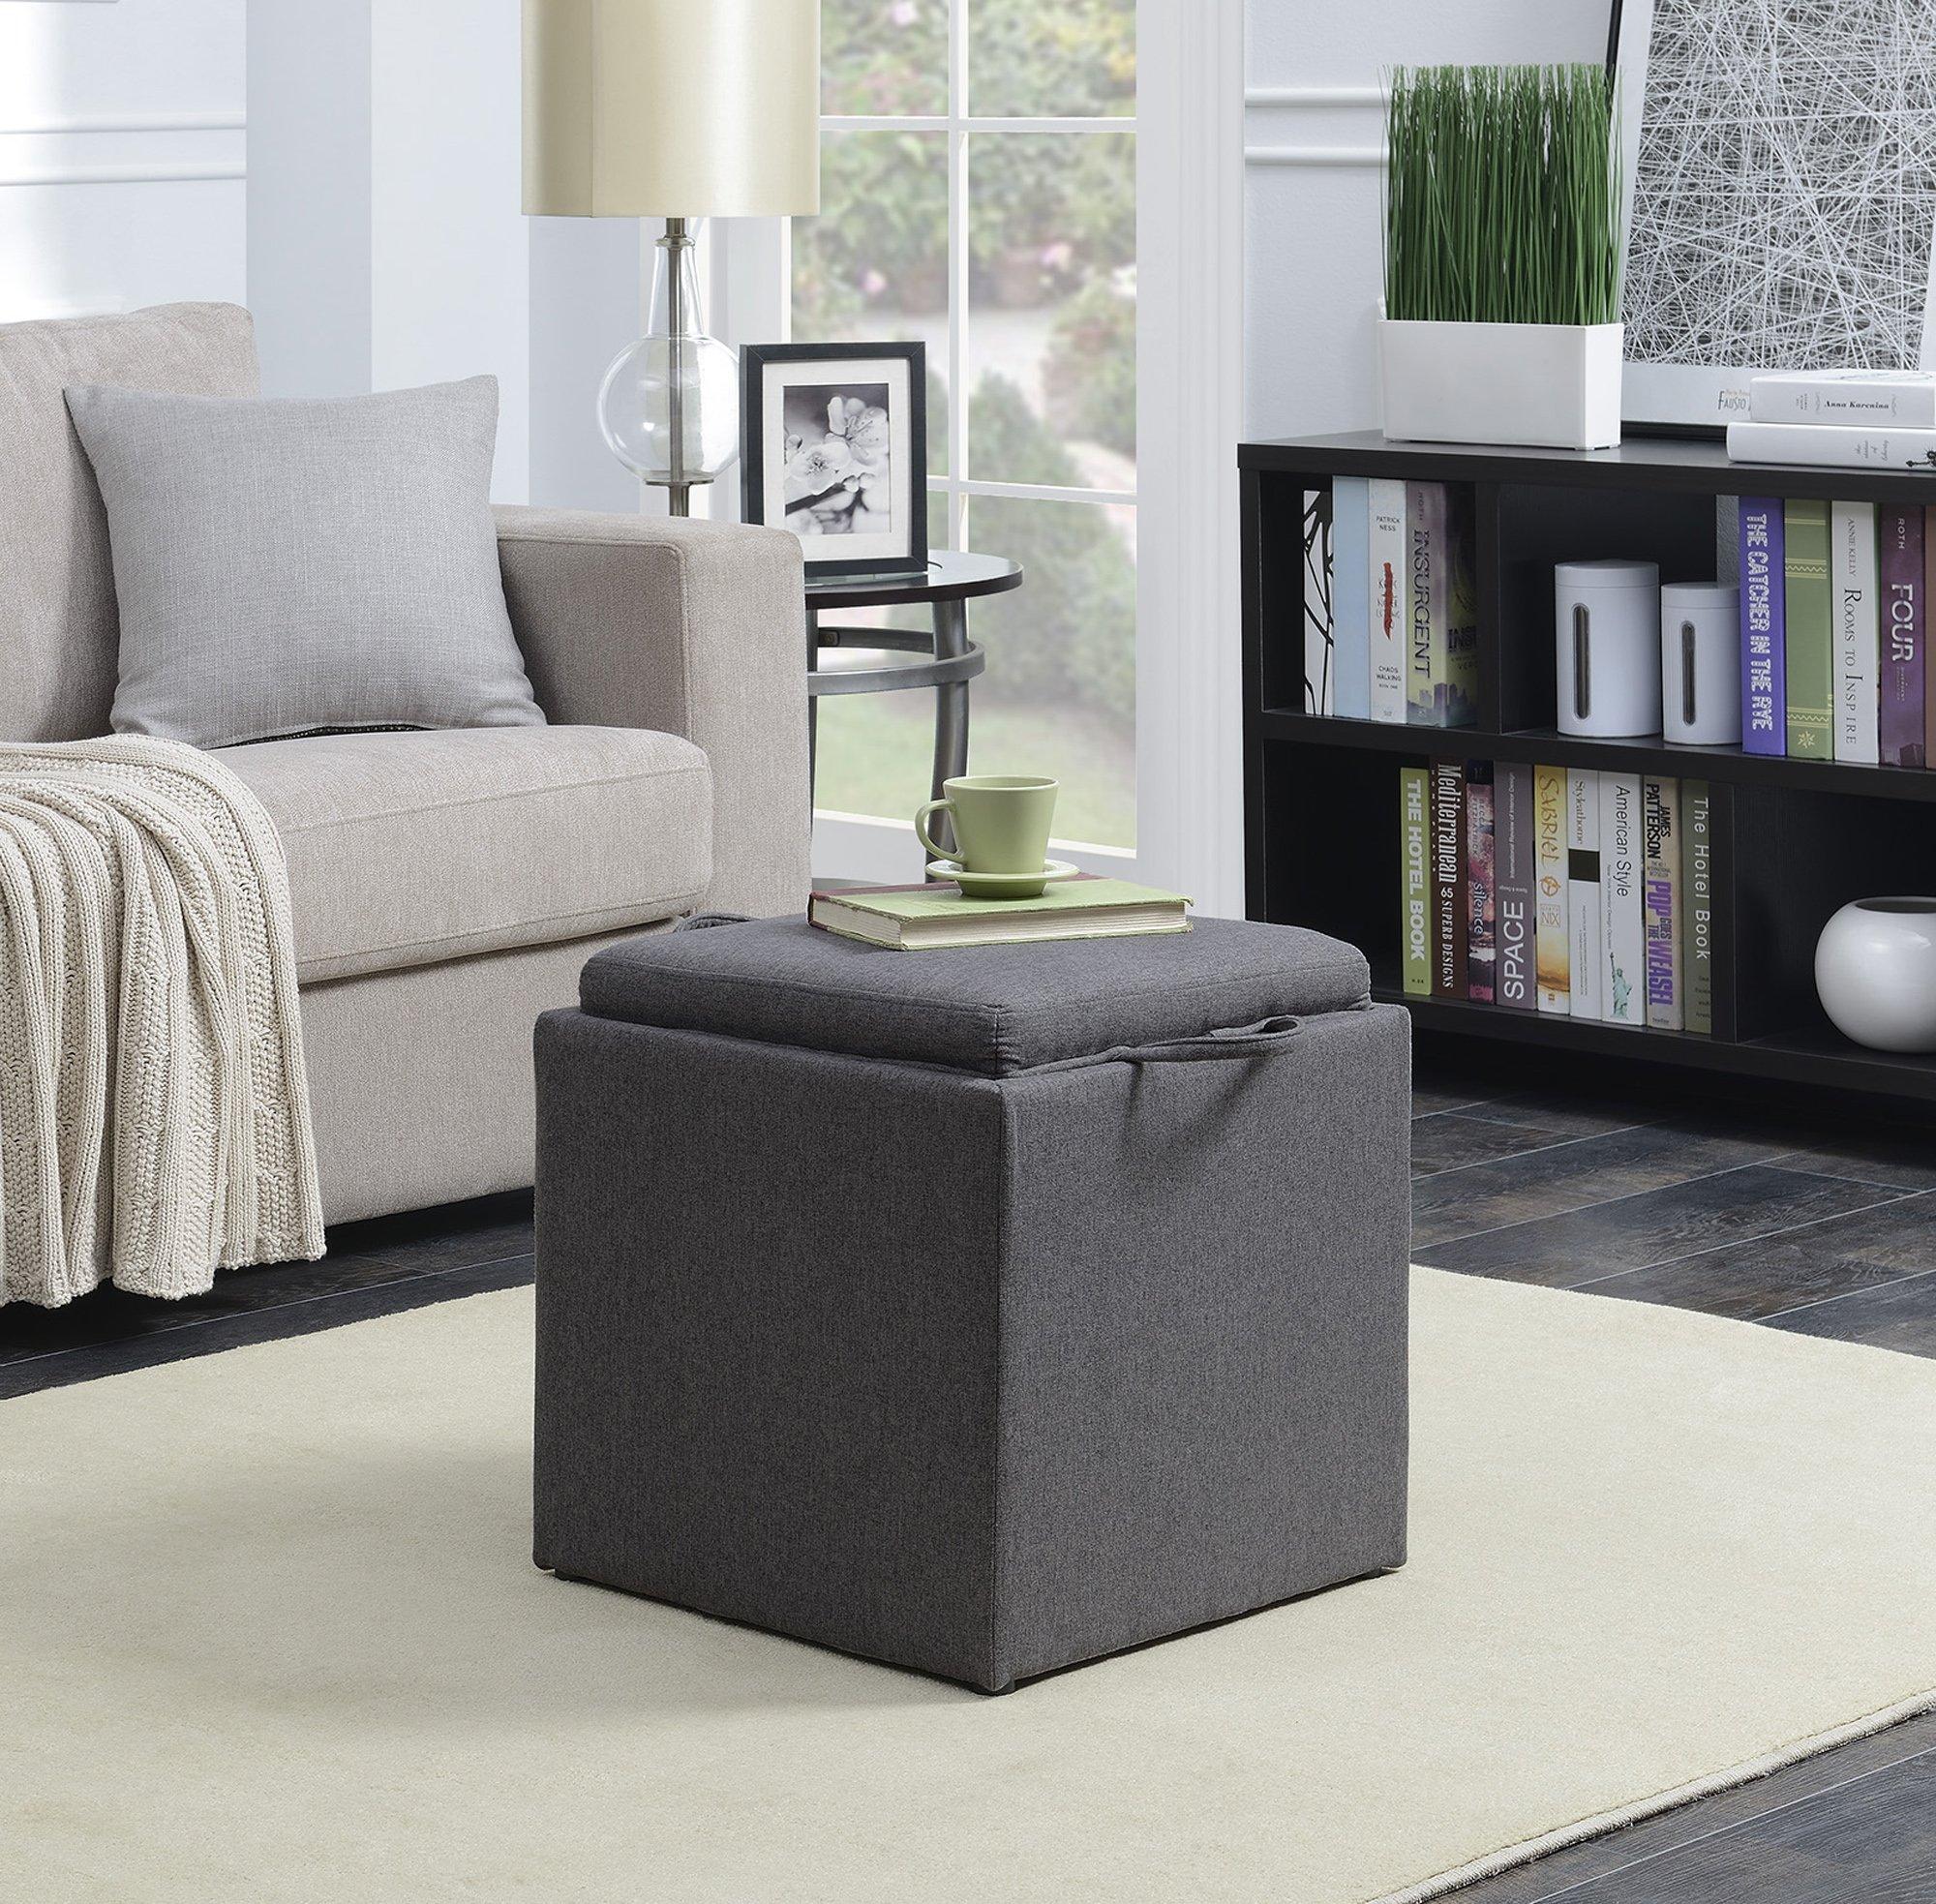 Convenience Concepts 143010FSGY Designs4Comfort Ottoman, Soft Gray Fabric